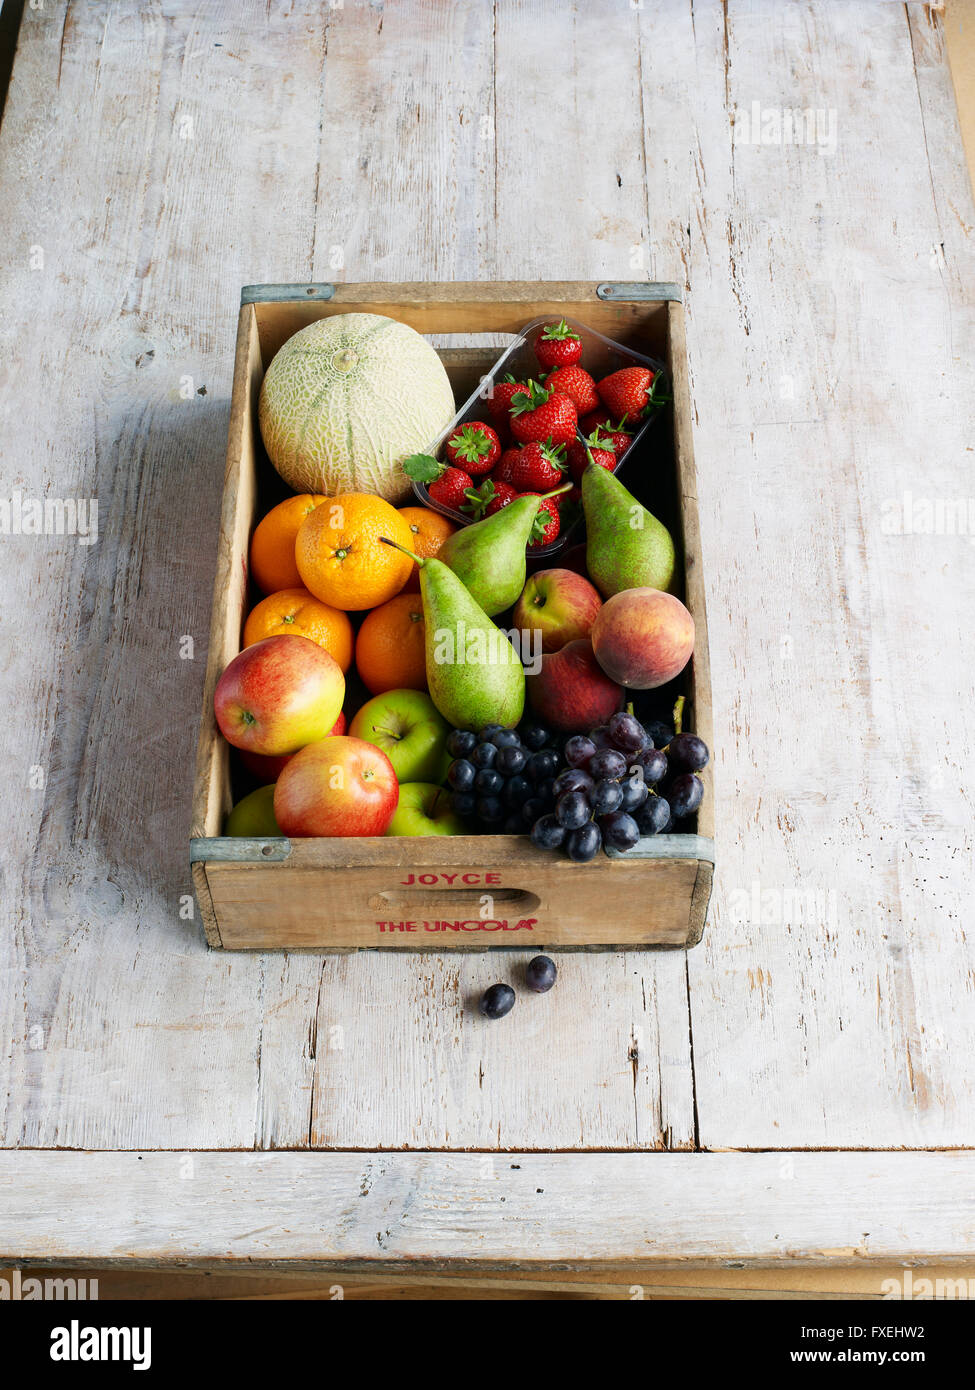 Varie frutta fresca in una cassa Immagini Stock